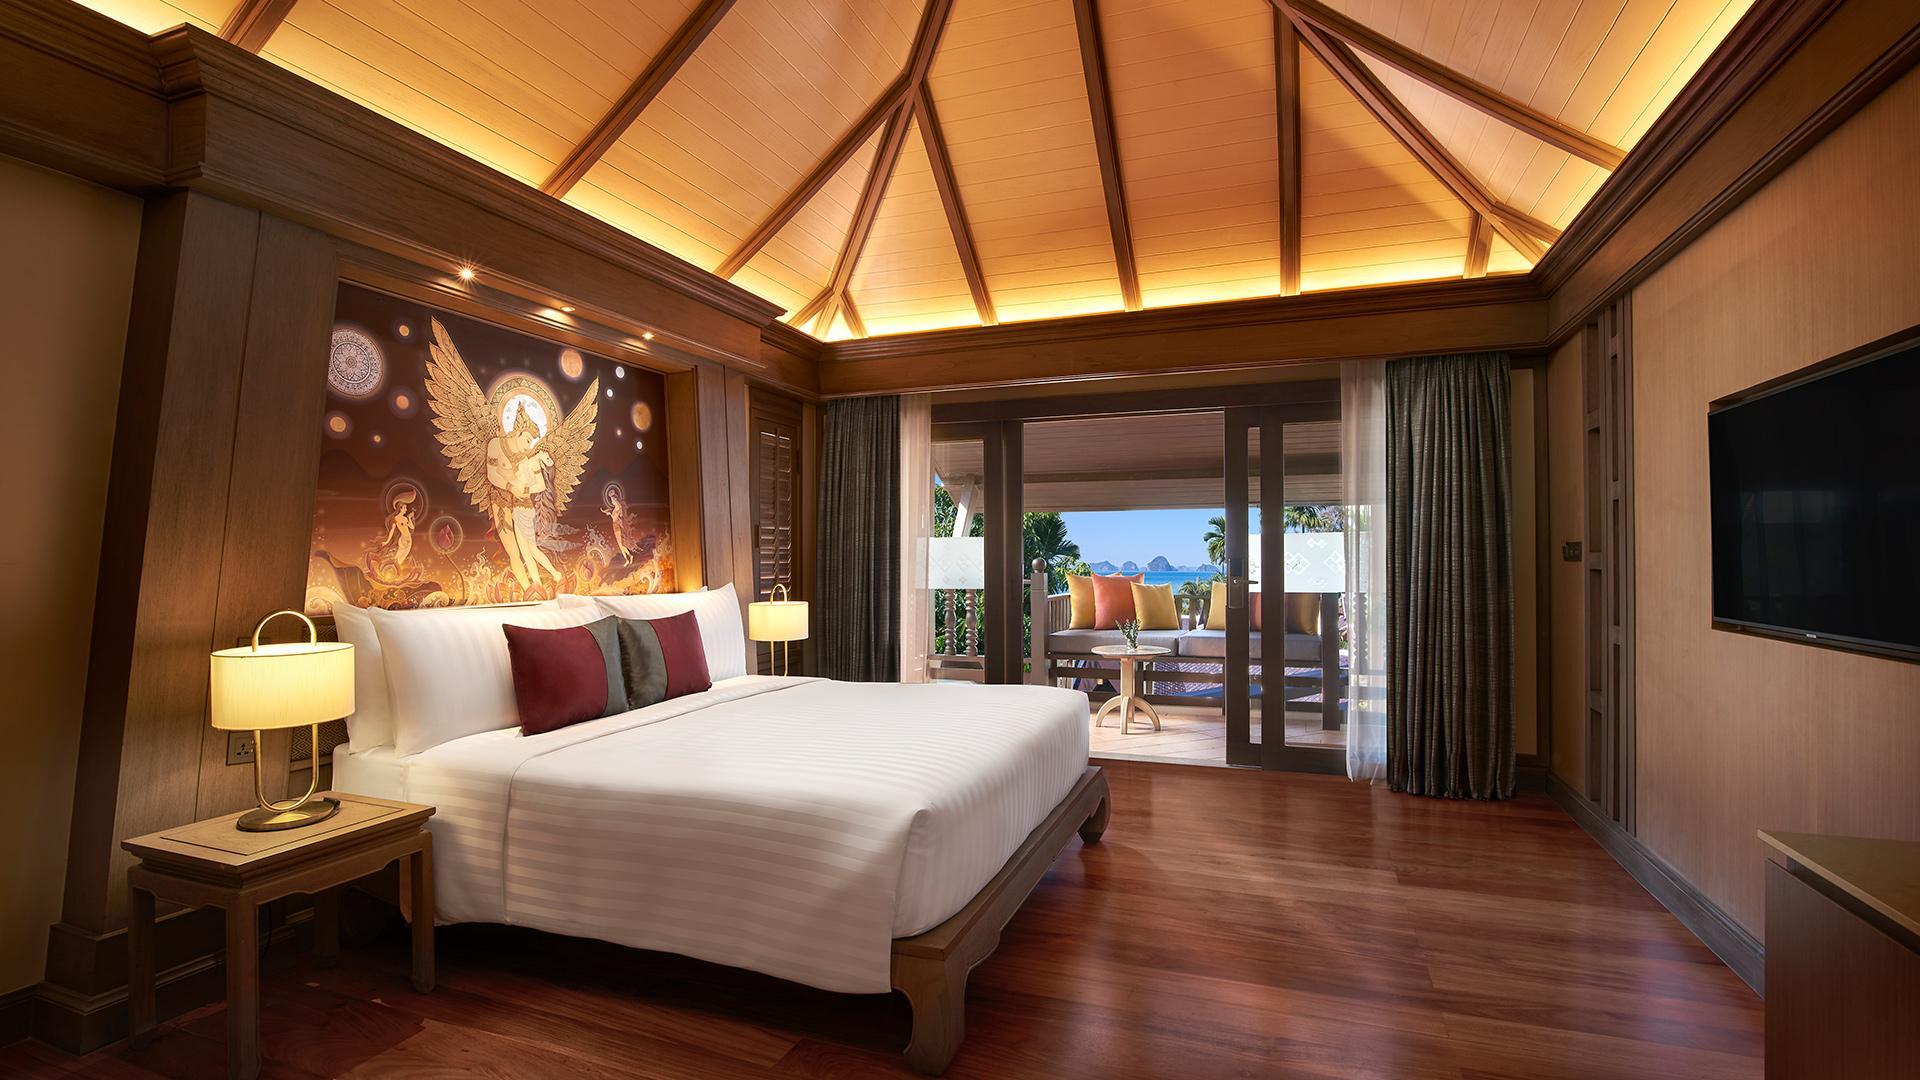 Grand Deluxe Room image 1 at Amari Vogue Krabi by Amphoe Mueang Krabi, Chang Wat Krabi, Thailand